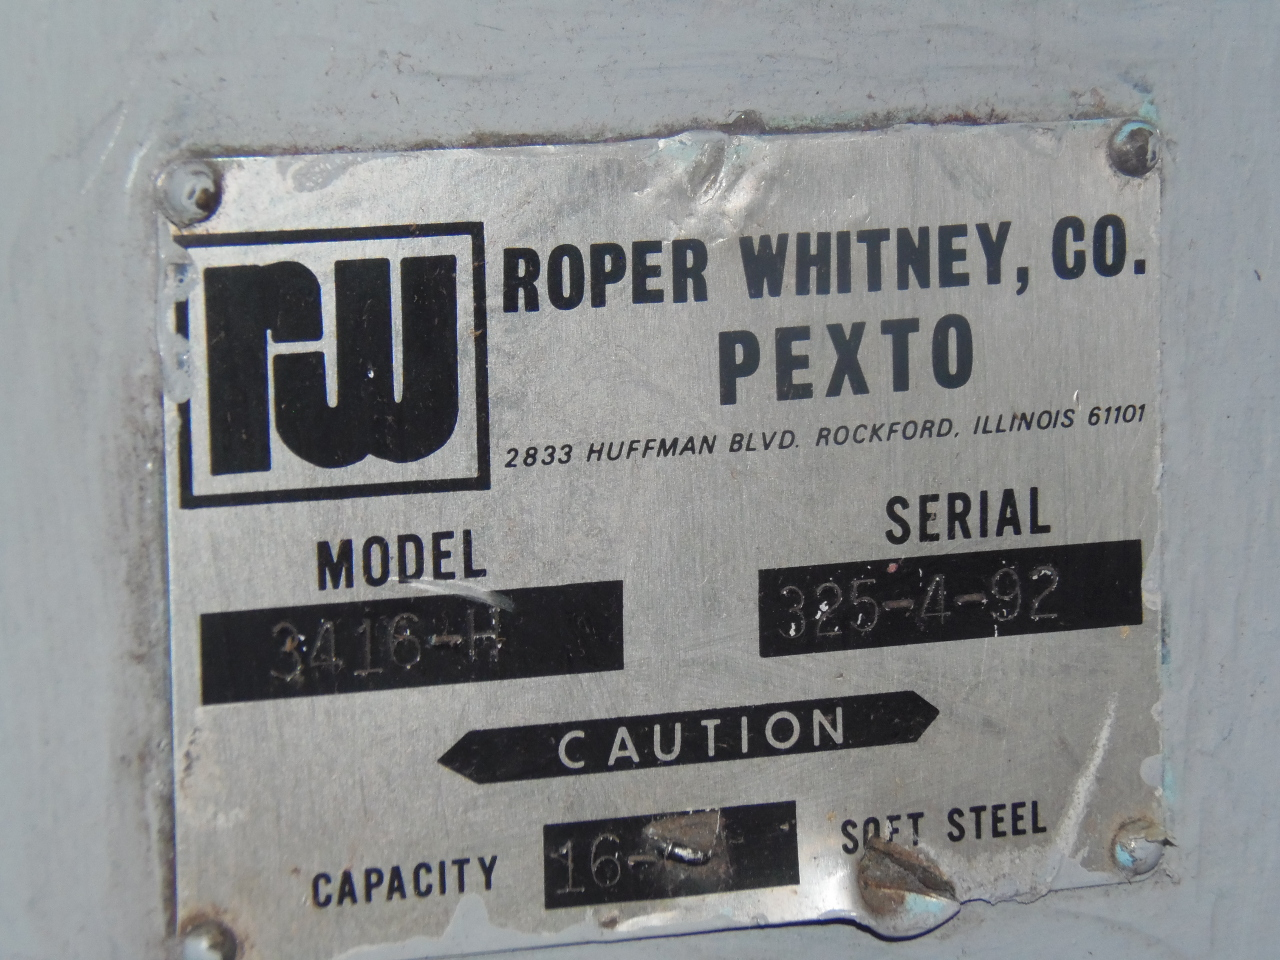 "16 GA X 36"" ROPER-WHITNEY ROLL, MODEL 1634H, 1992, INITIAL PINCH"